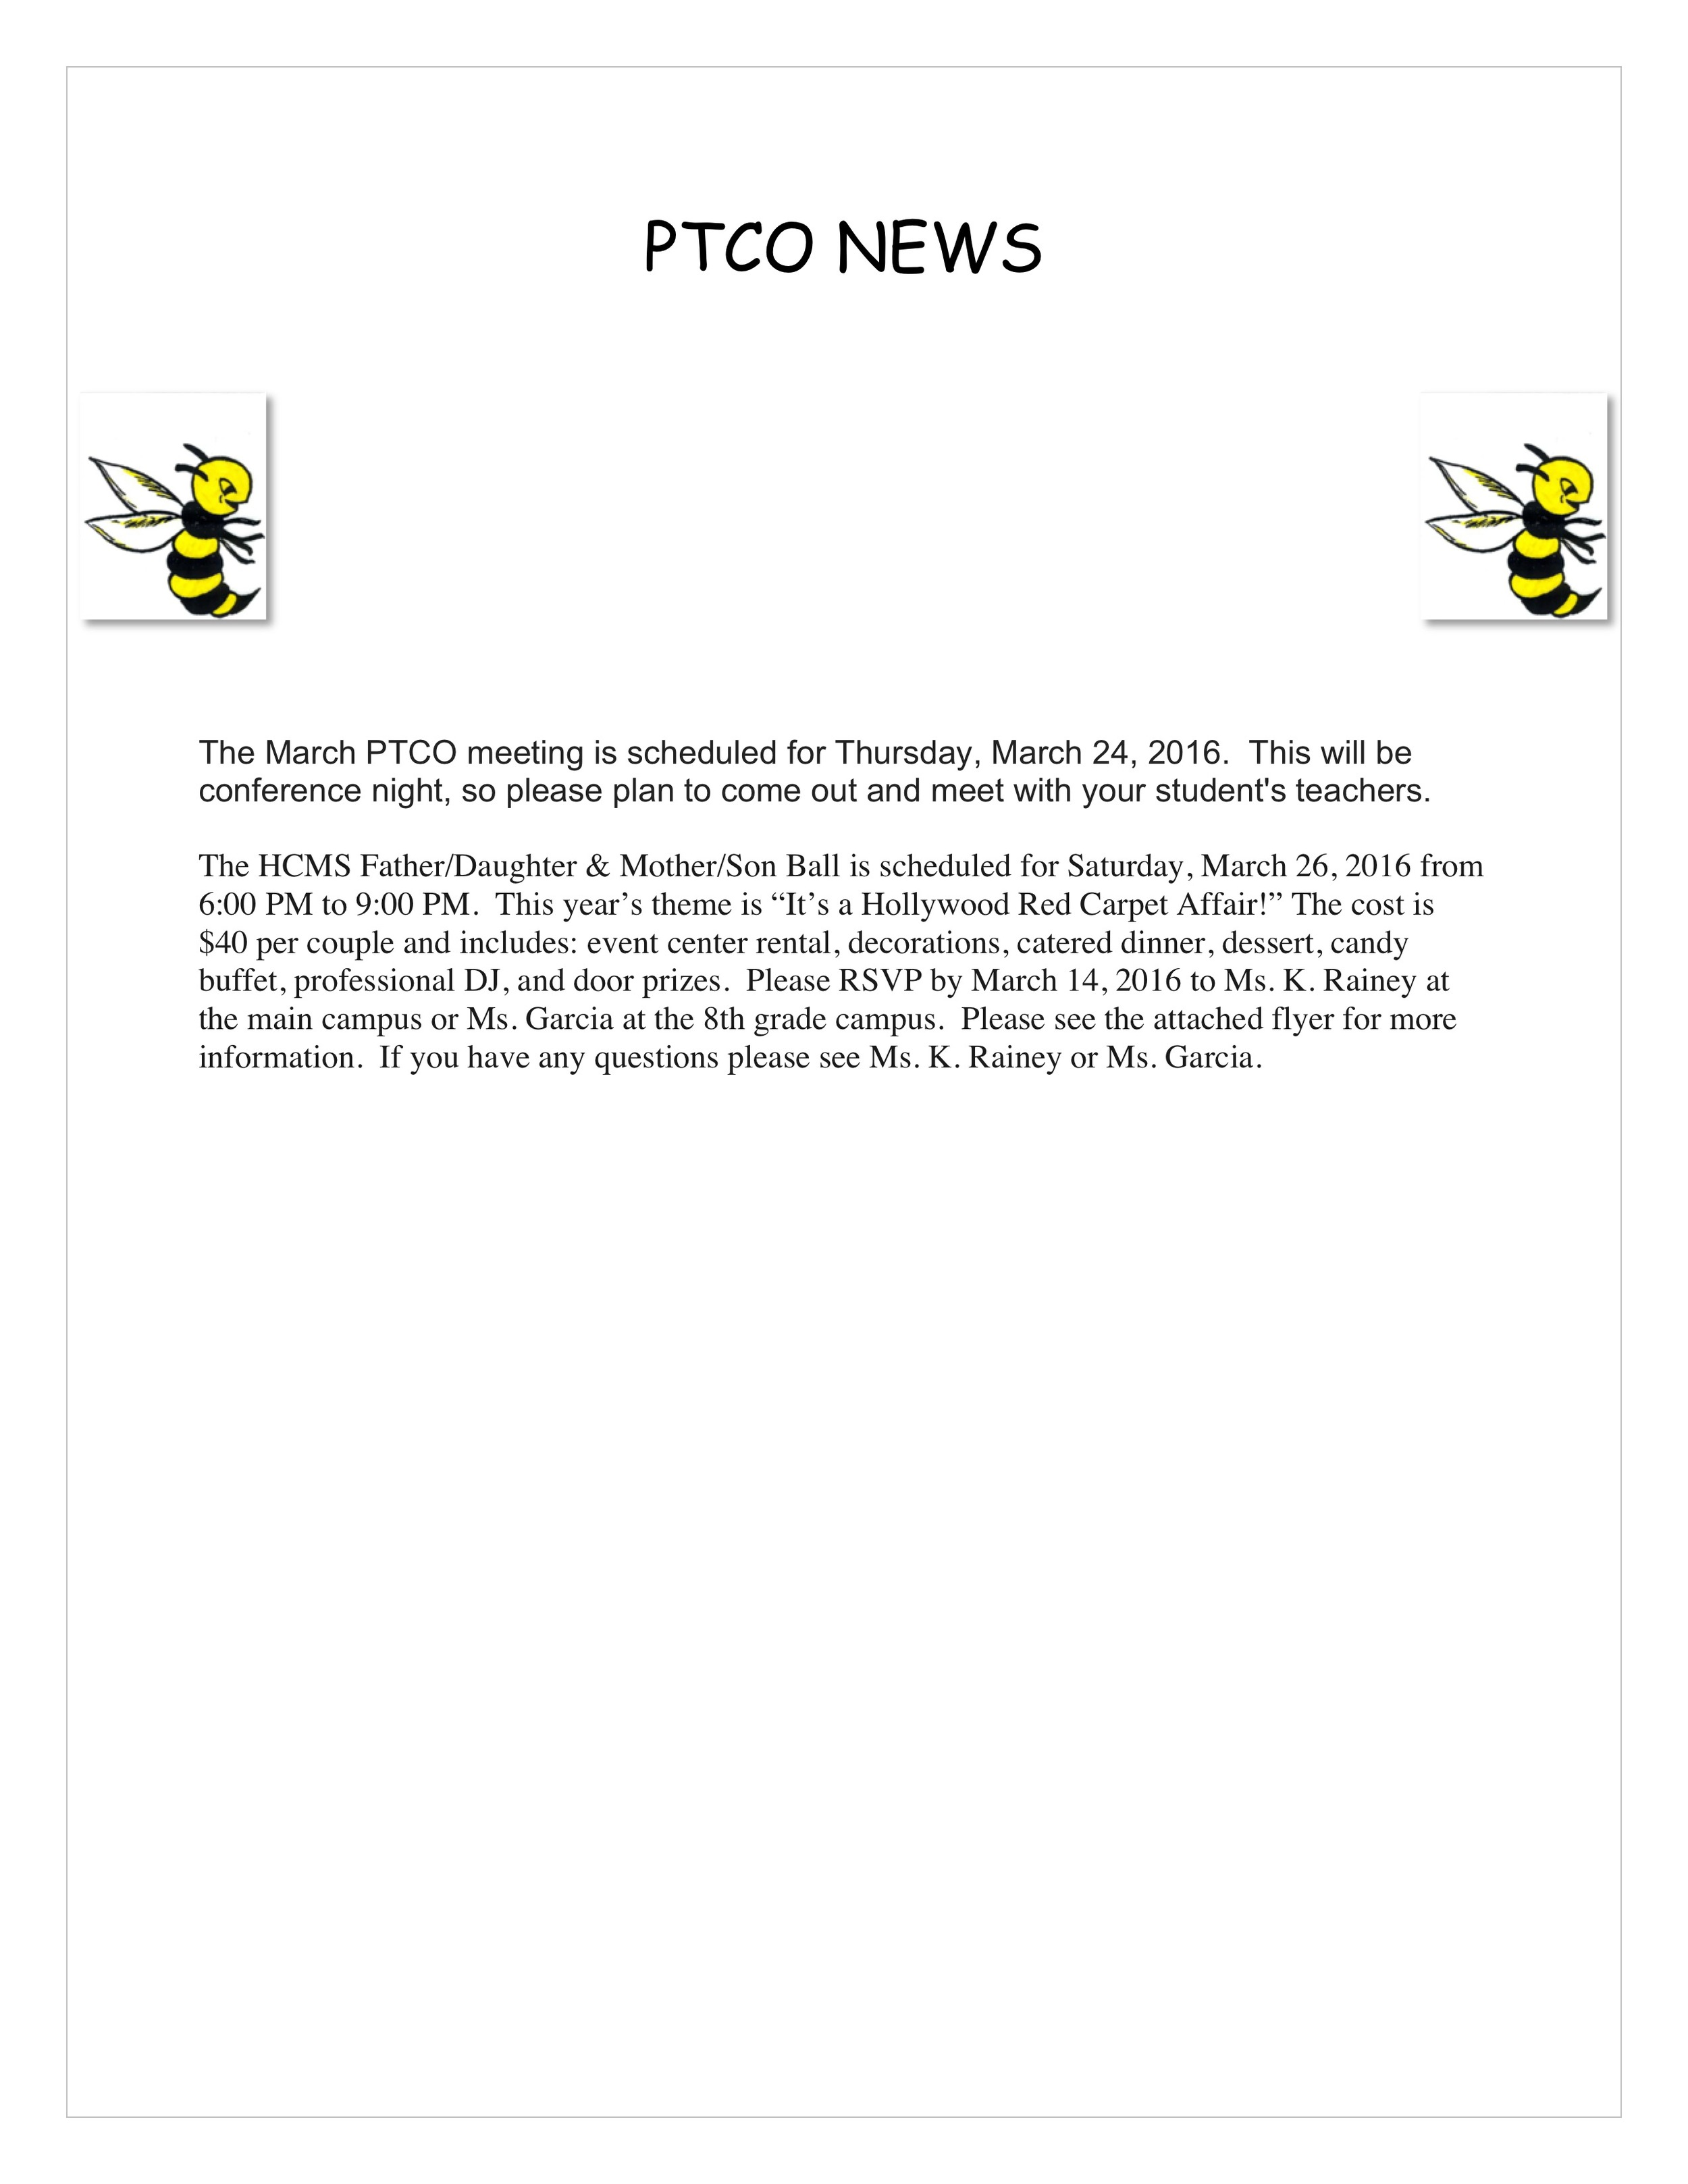 Newsletter Image8th grade 3-14 3.jpeg